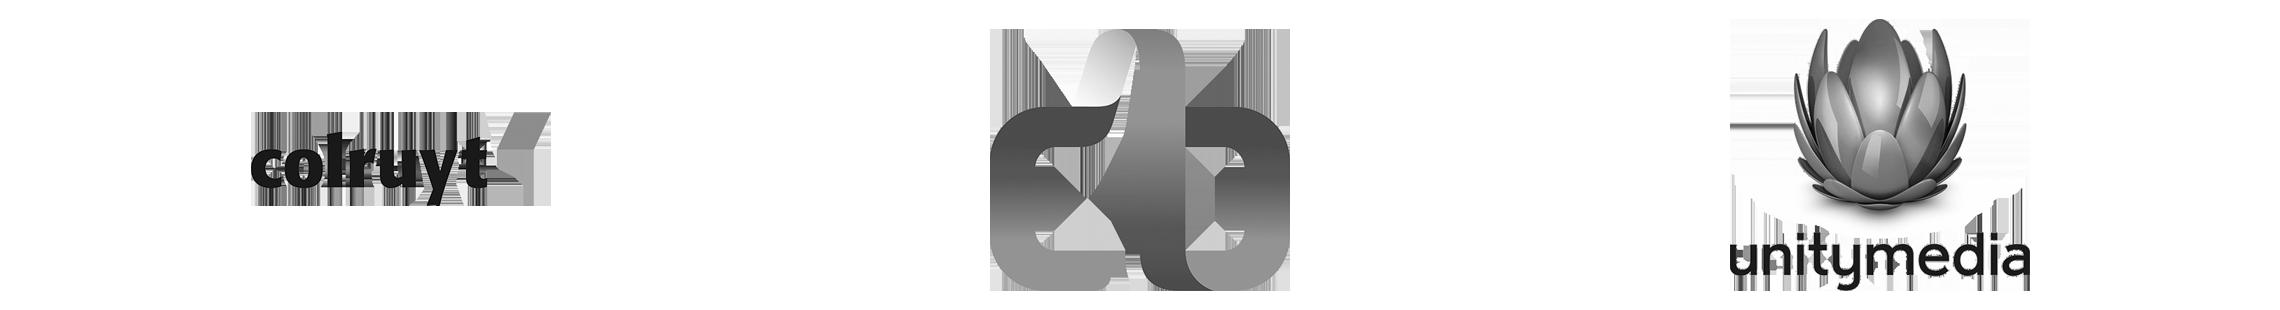 Mediaan's customers logos